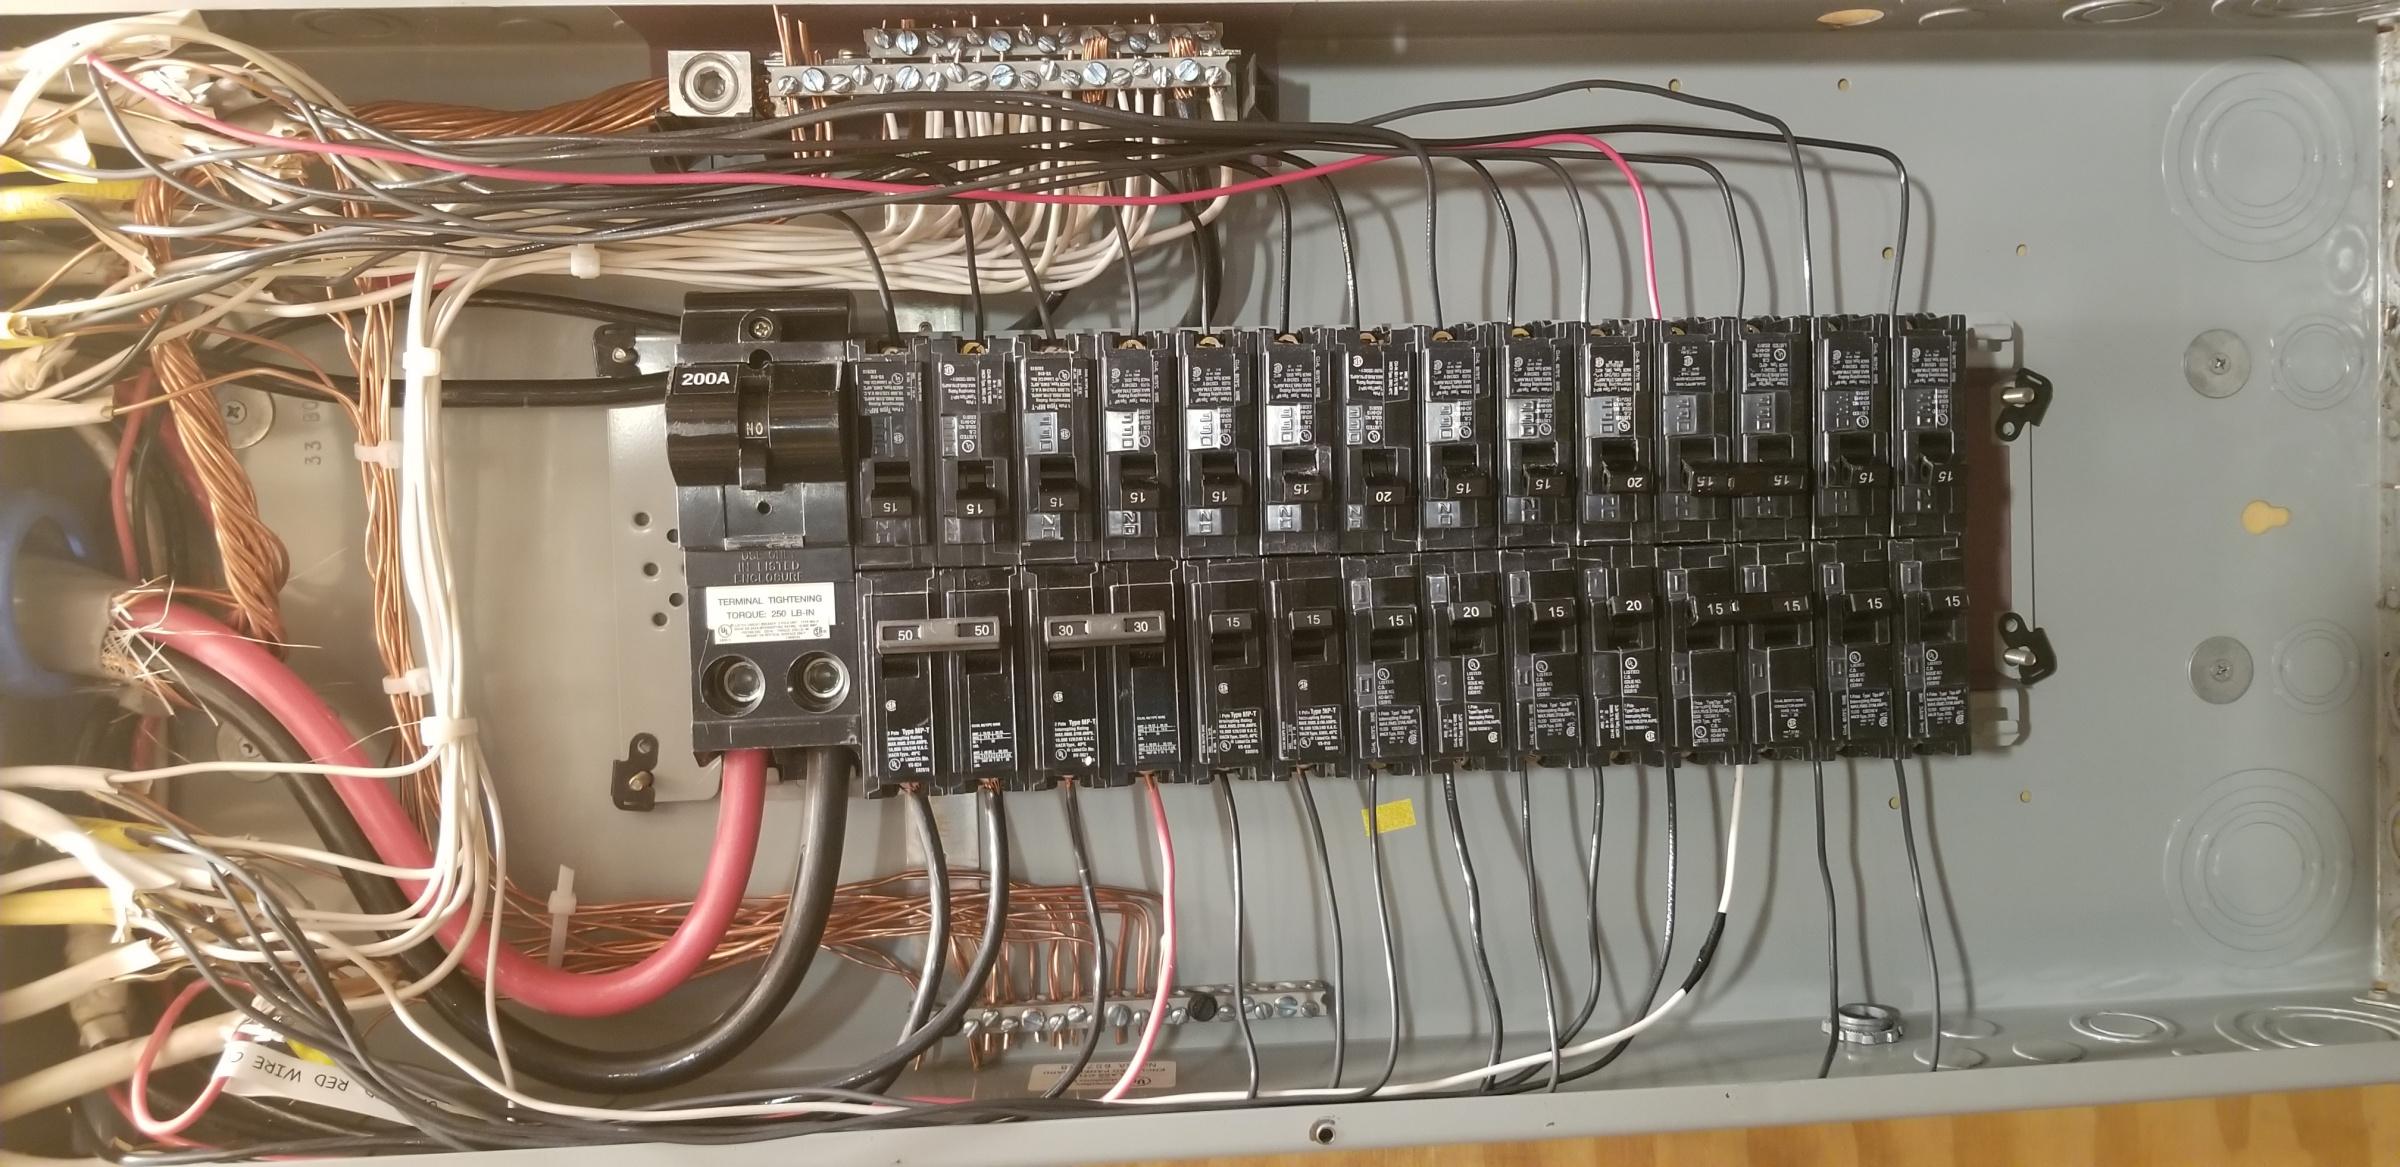 Circuit Breaker Box - Electrical